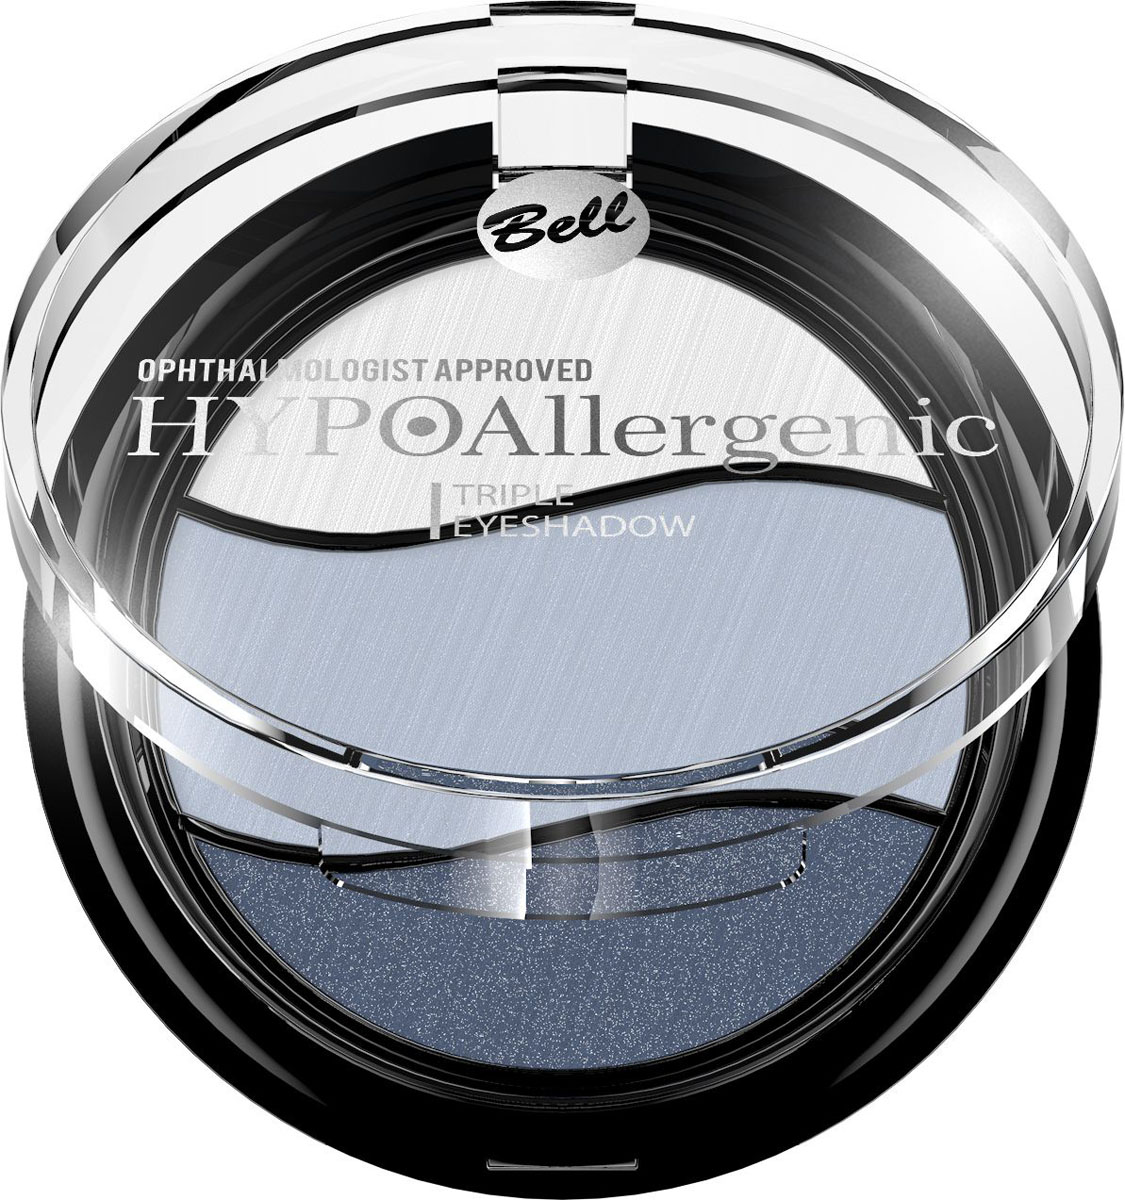 Bell Hypoallergenic Тени для век трехцветные, гипоаллергенные Triple Eyeshadow, Тон №03